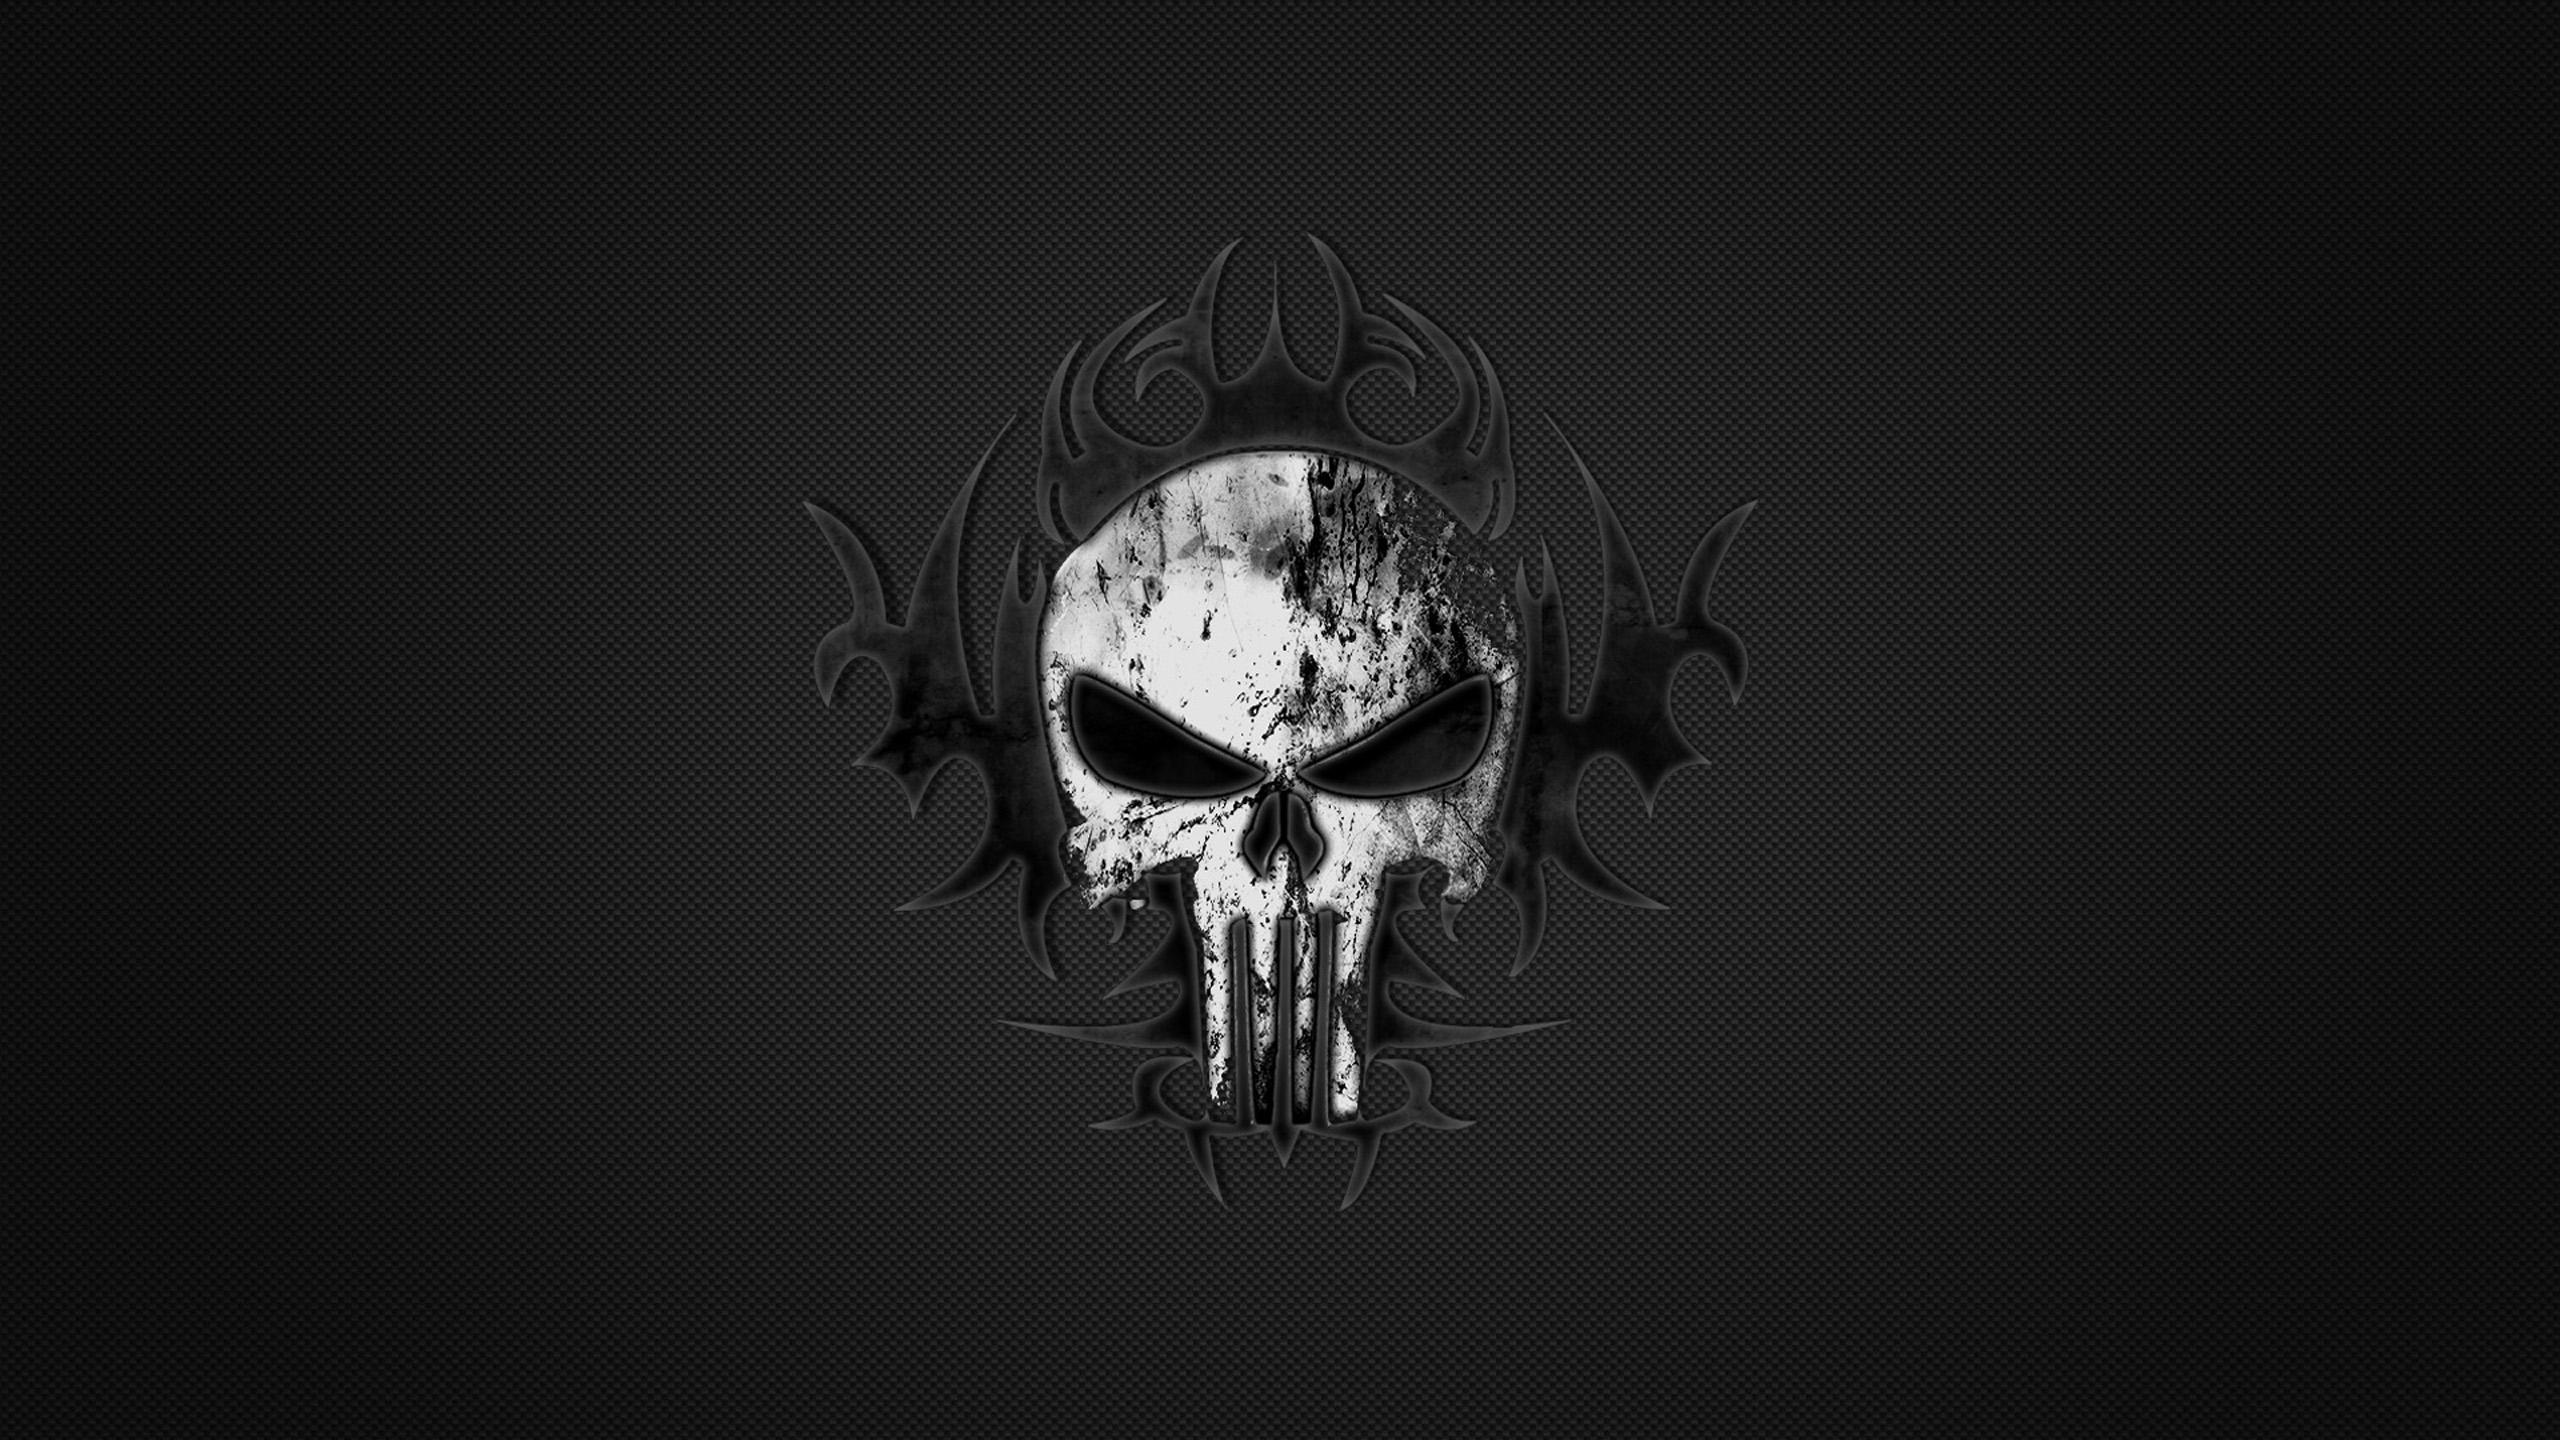 Gallery: The Punisher Logo Wallpaper